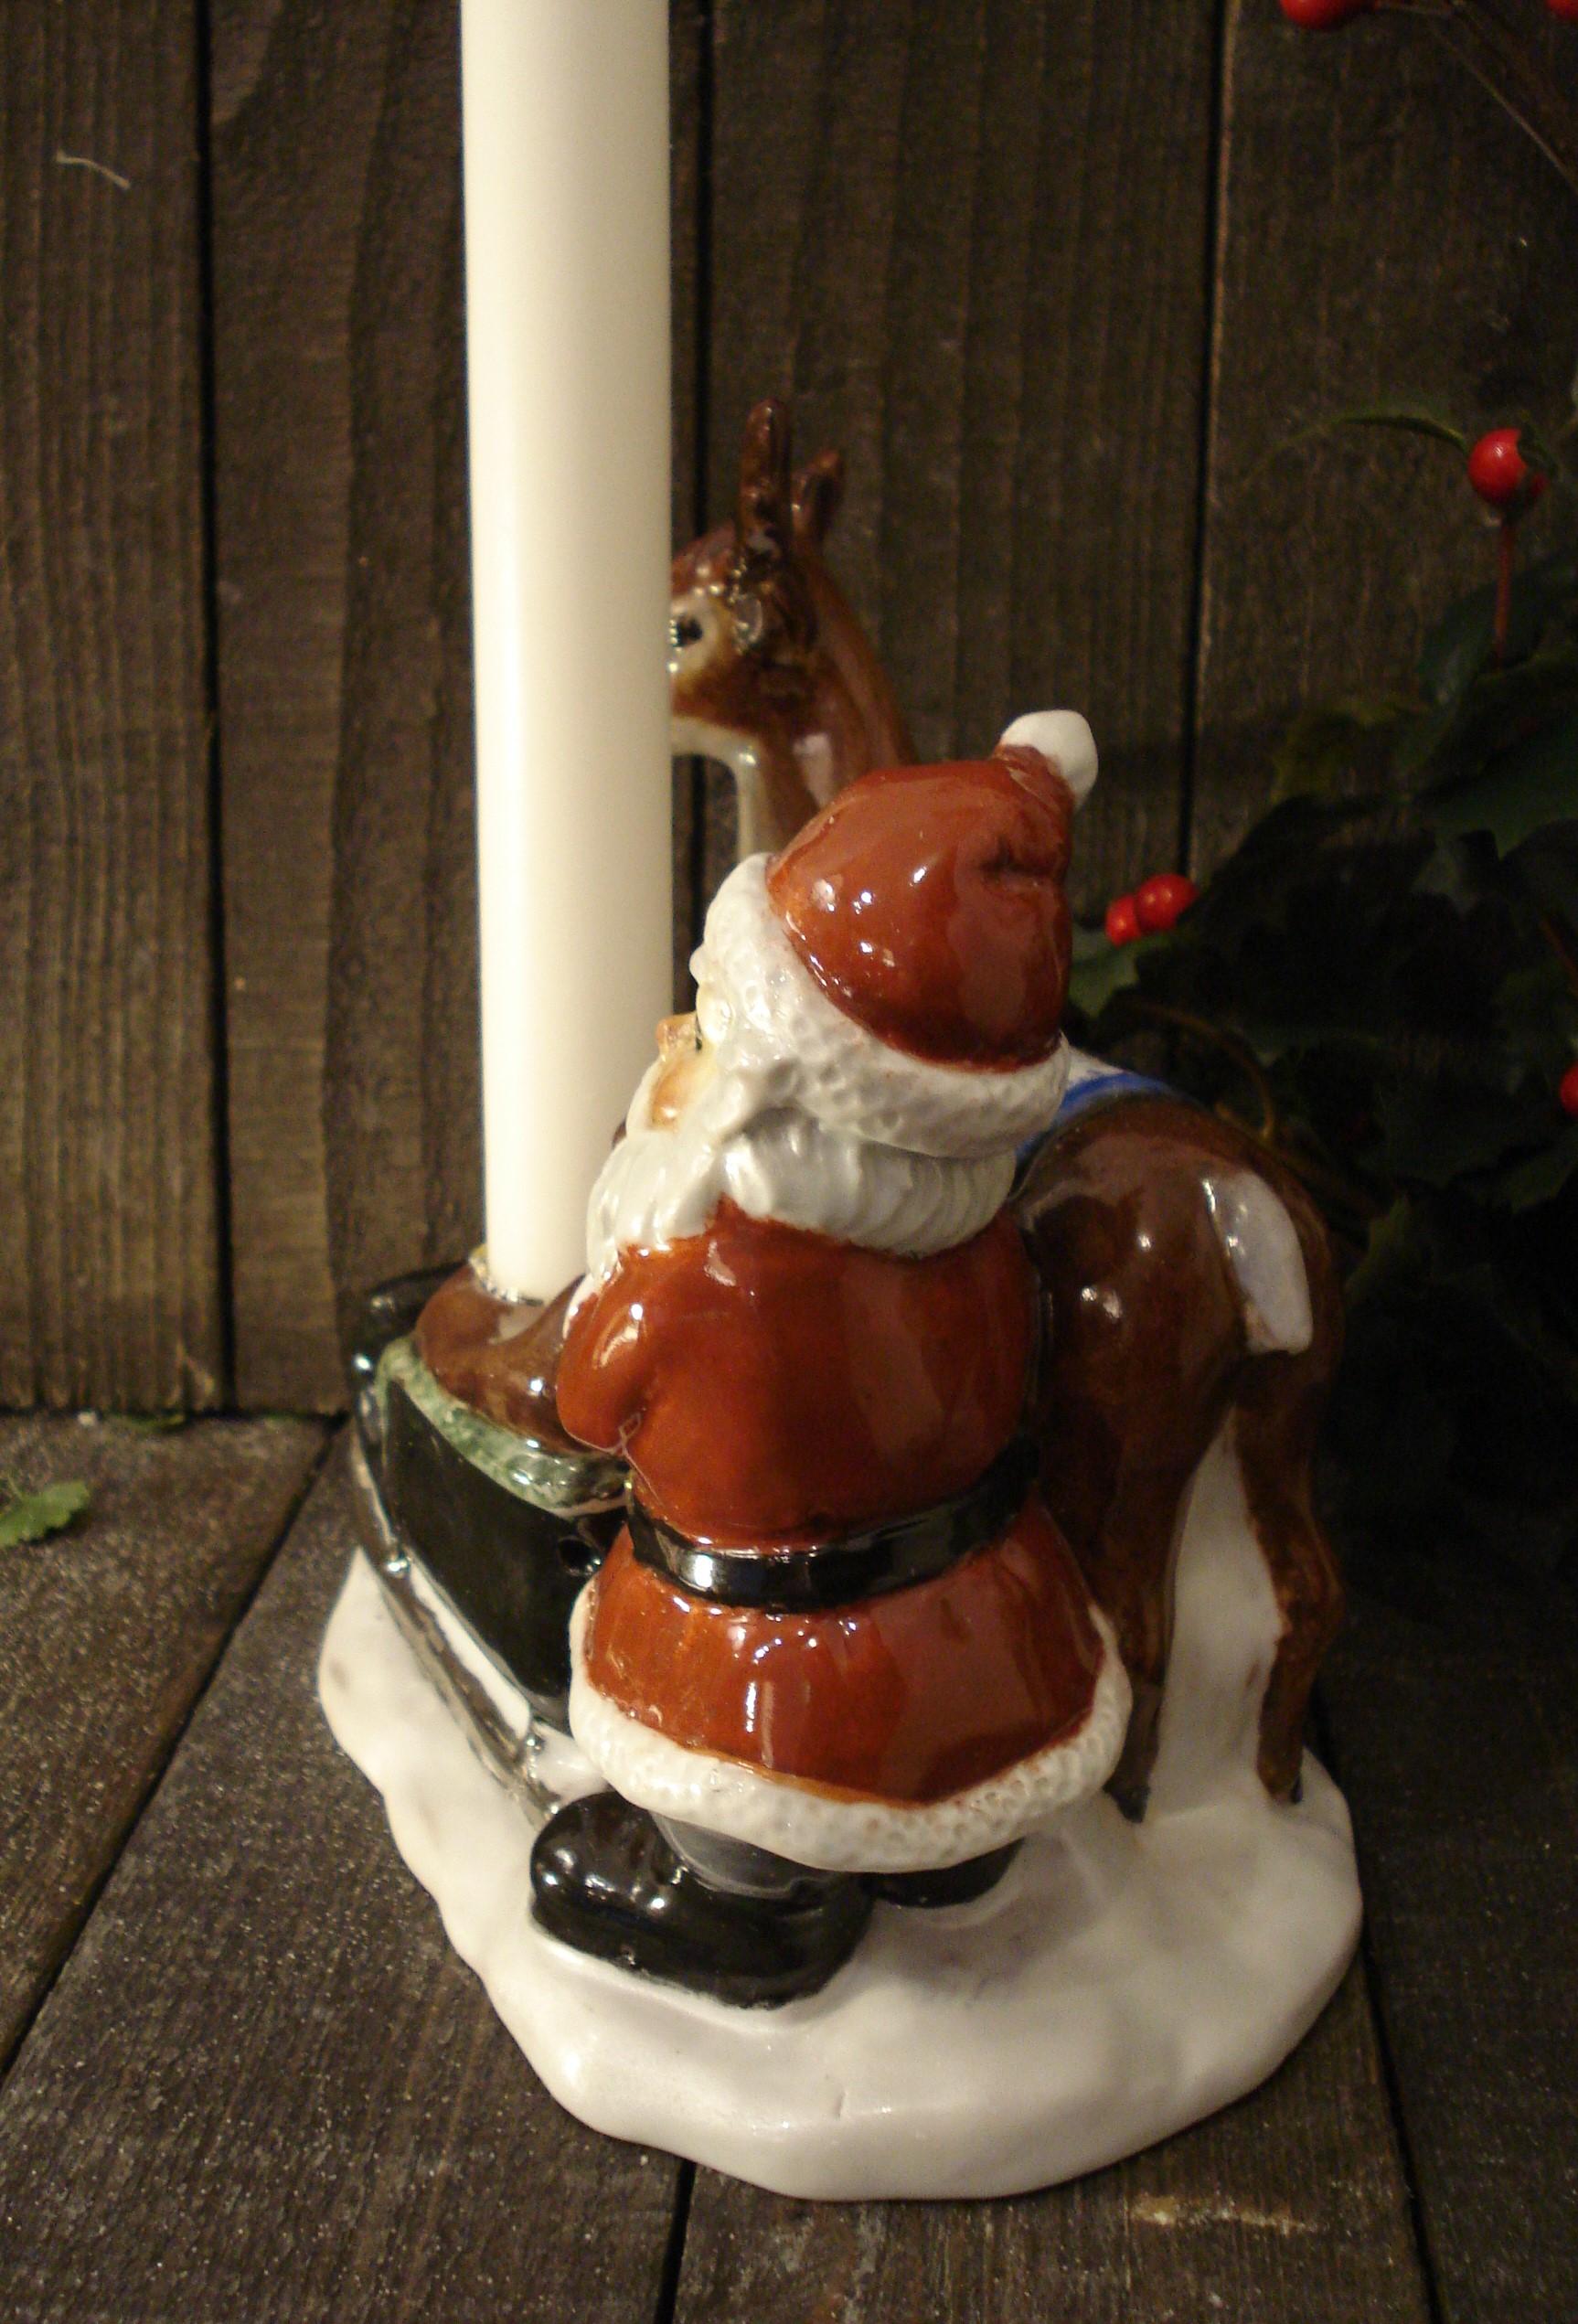 Kane med rensdyr og julemand